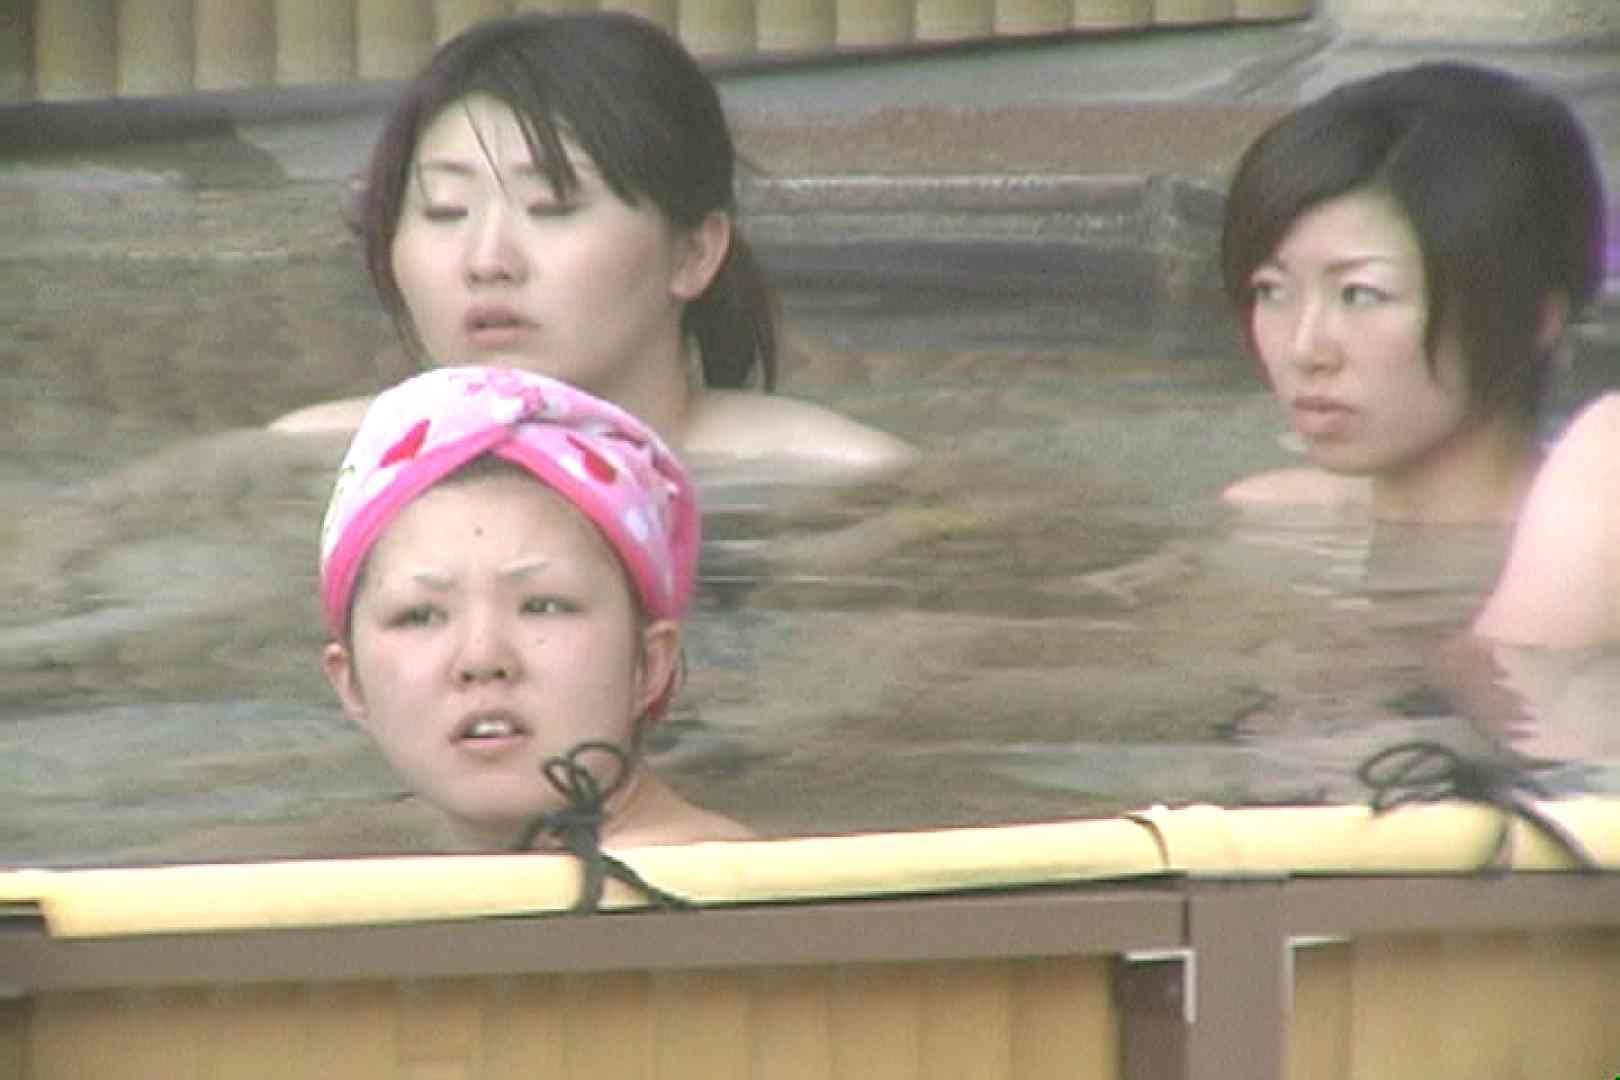 Aquaな露天風呂Vol.25 美しいOLの裸体 おまんこ無修正動画無料 72pic 23